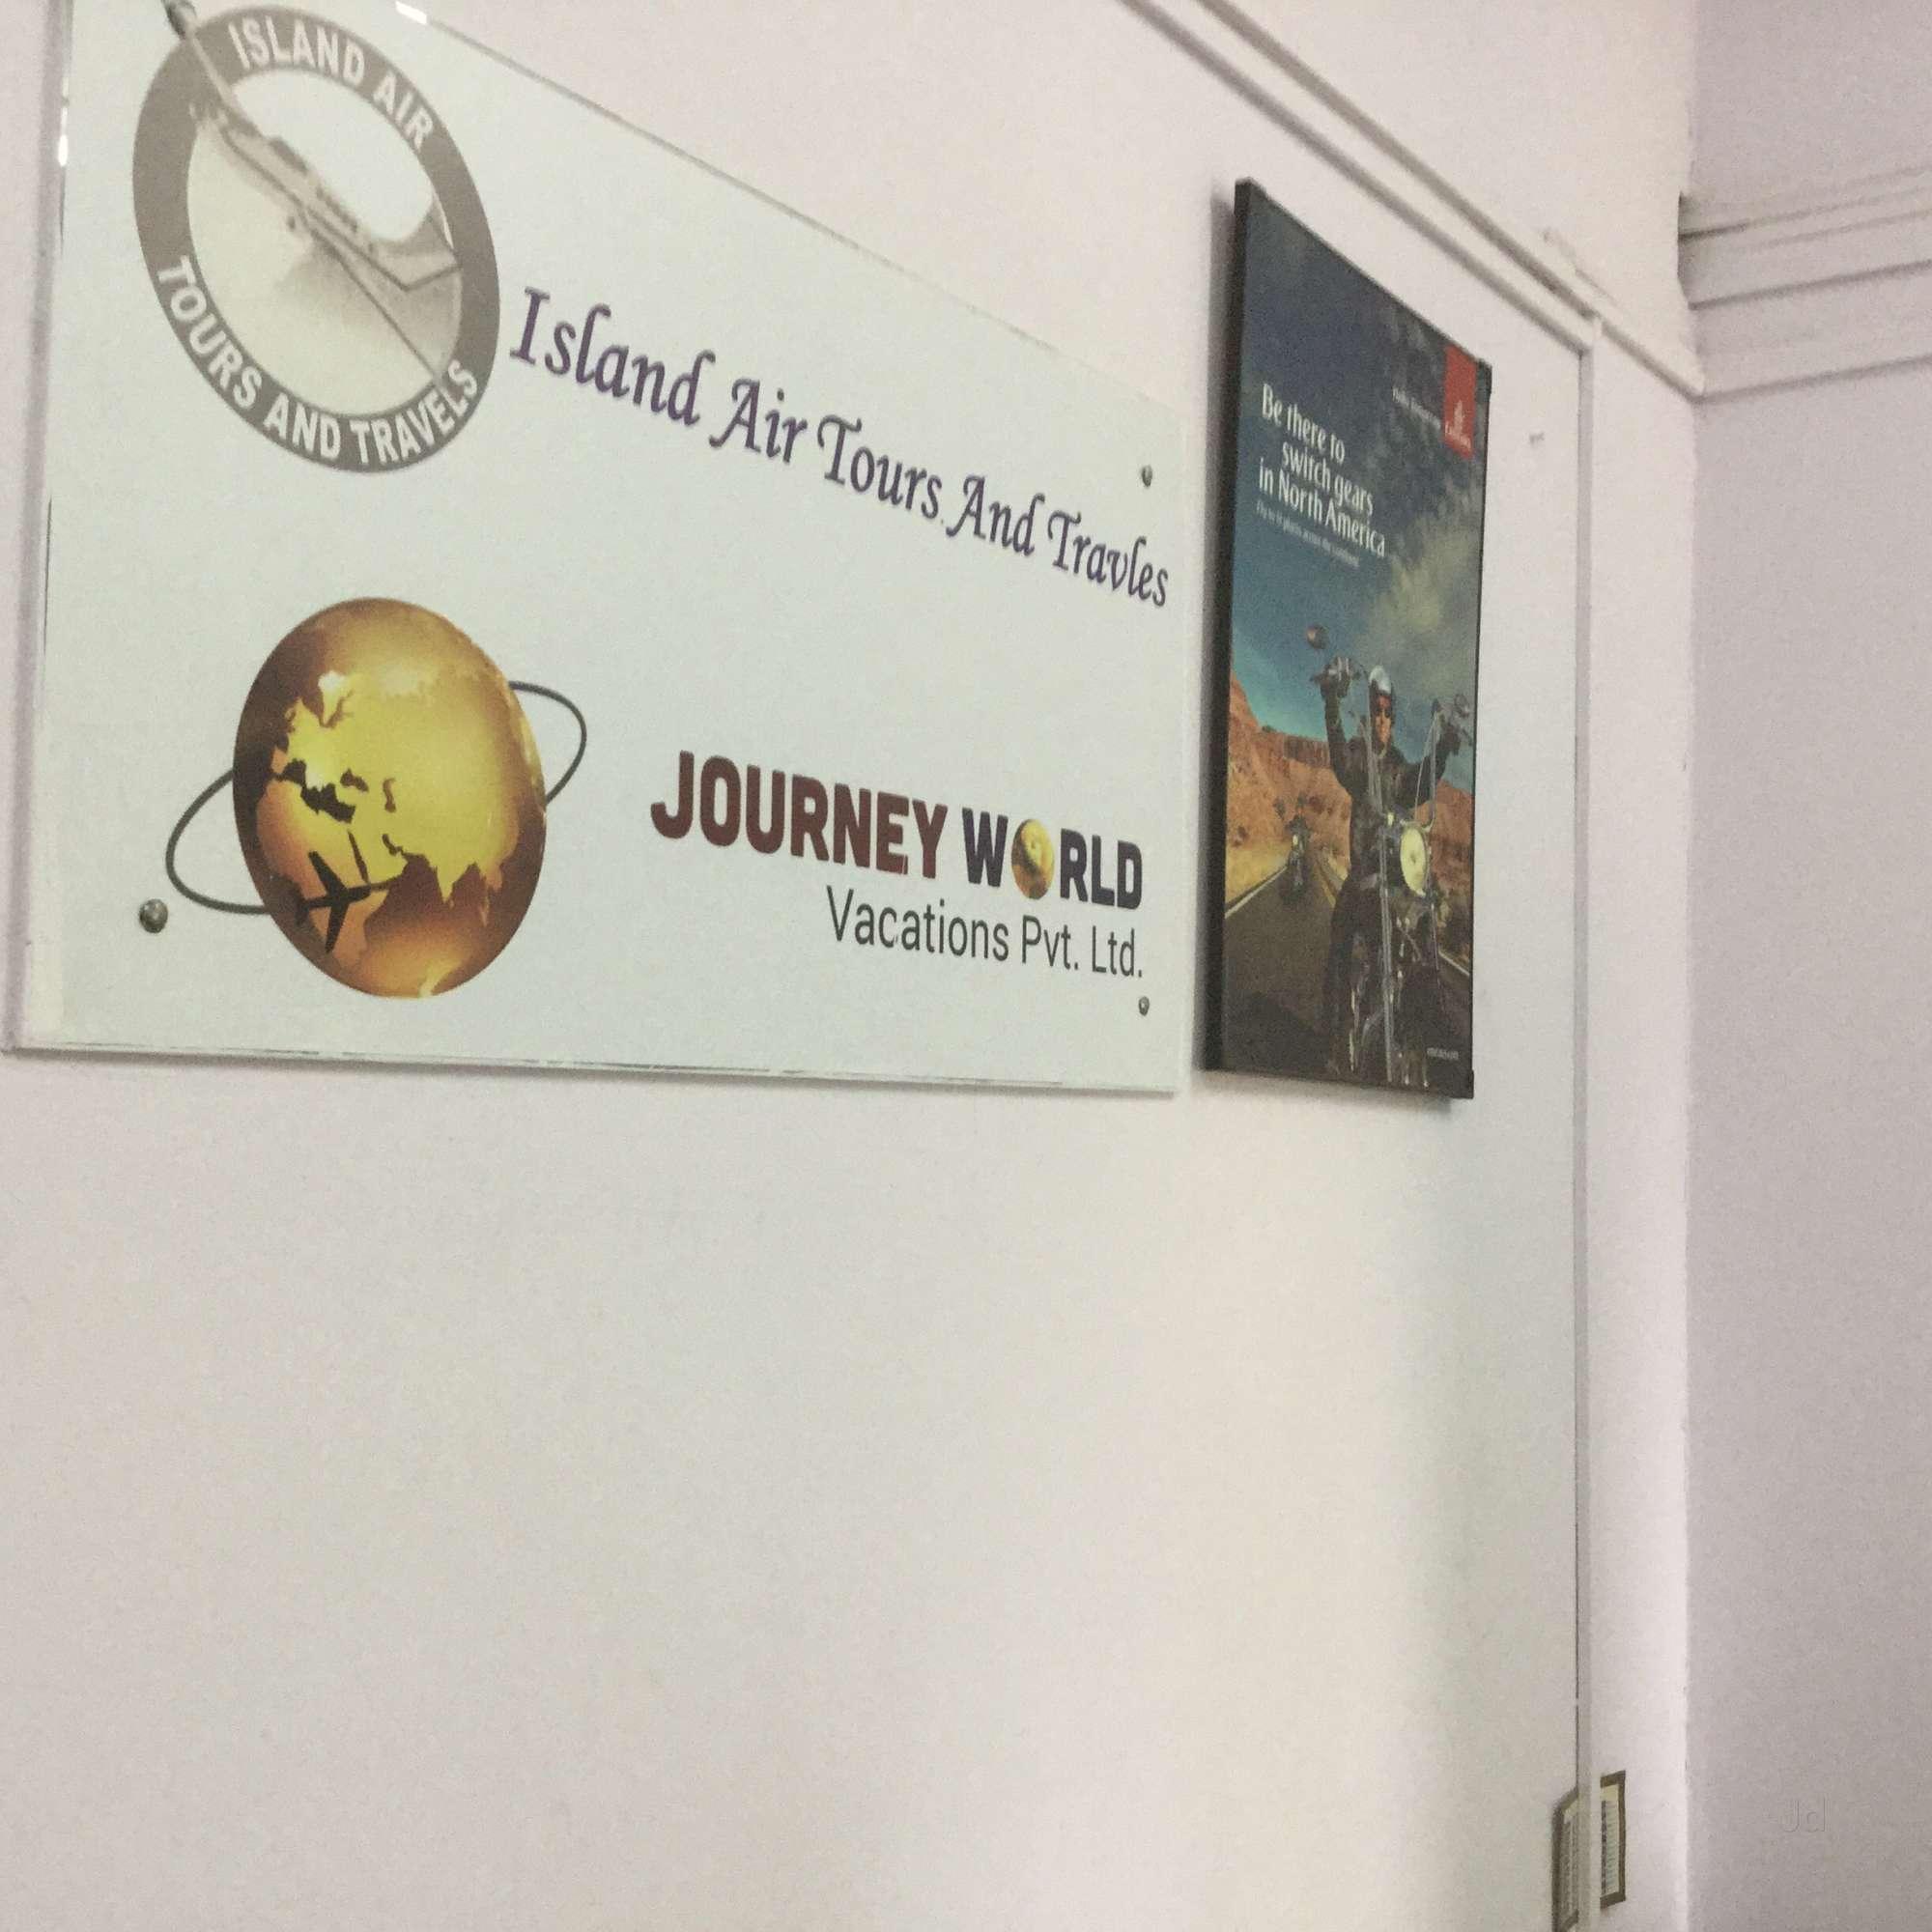 Journey World Vacations Pvt Ltd